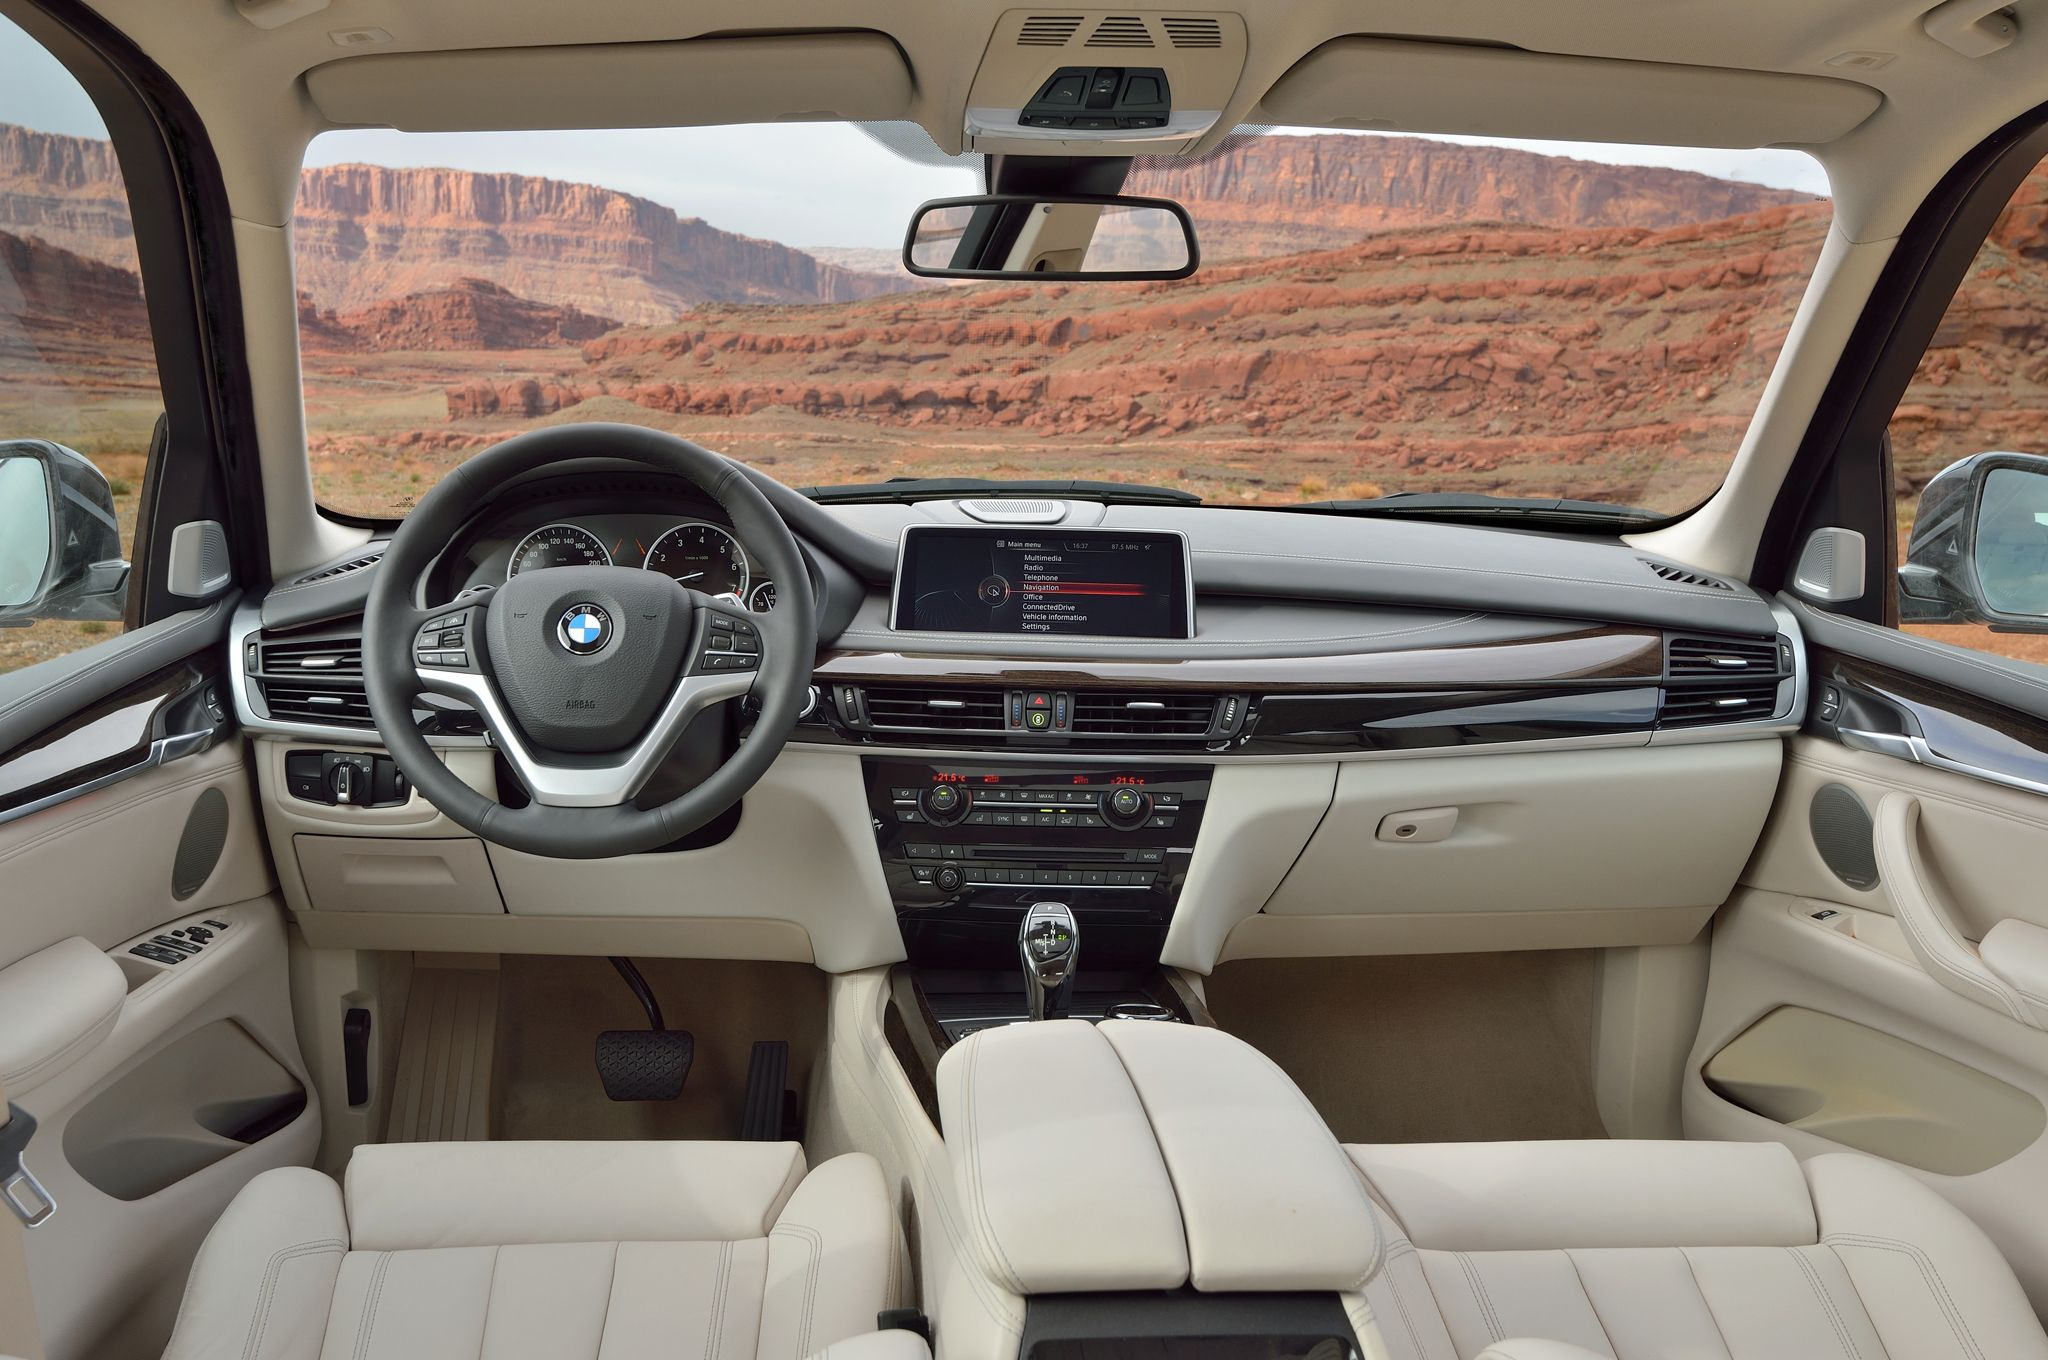 bmw 2014 x5 interior. bmw x5 interior cream leather bmw 2014